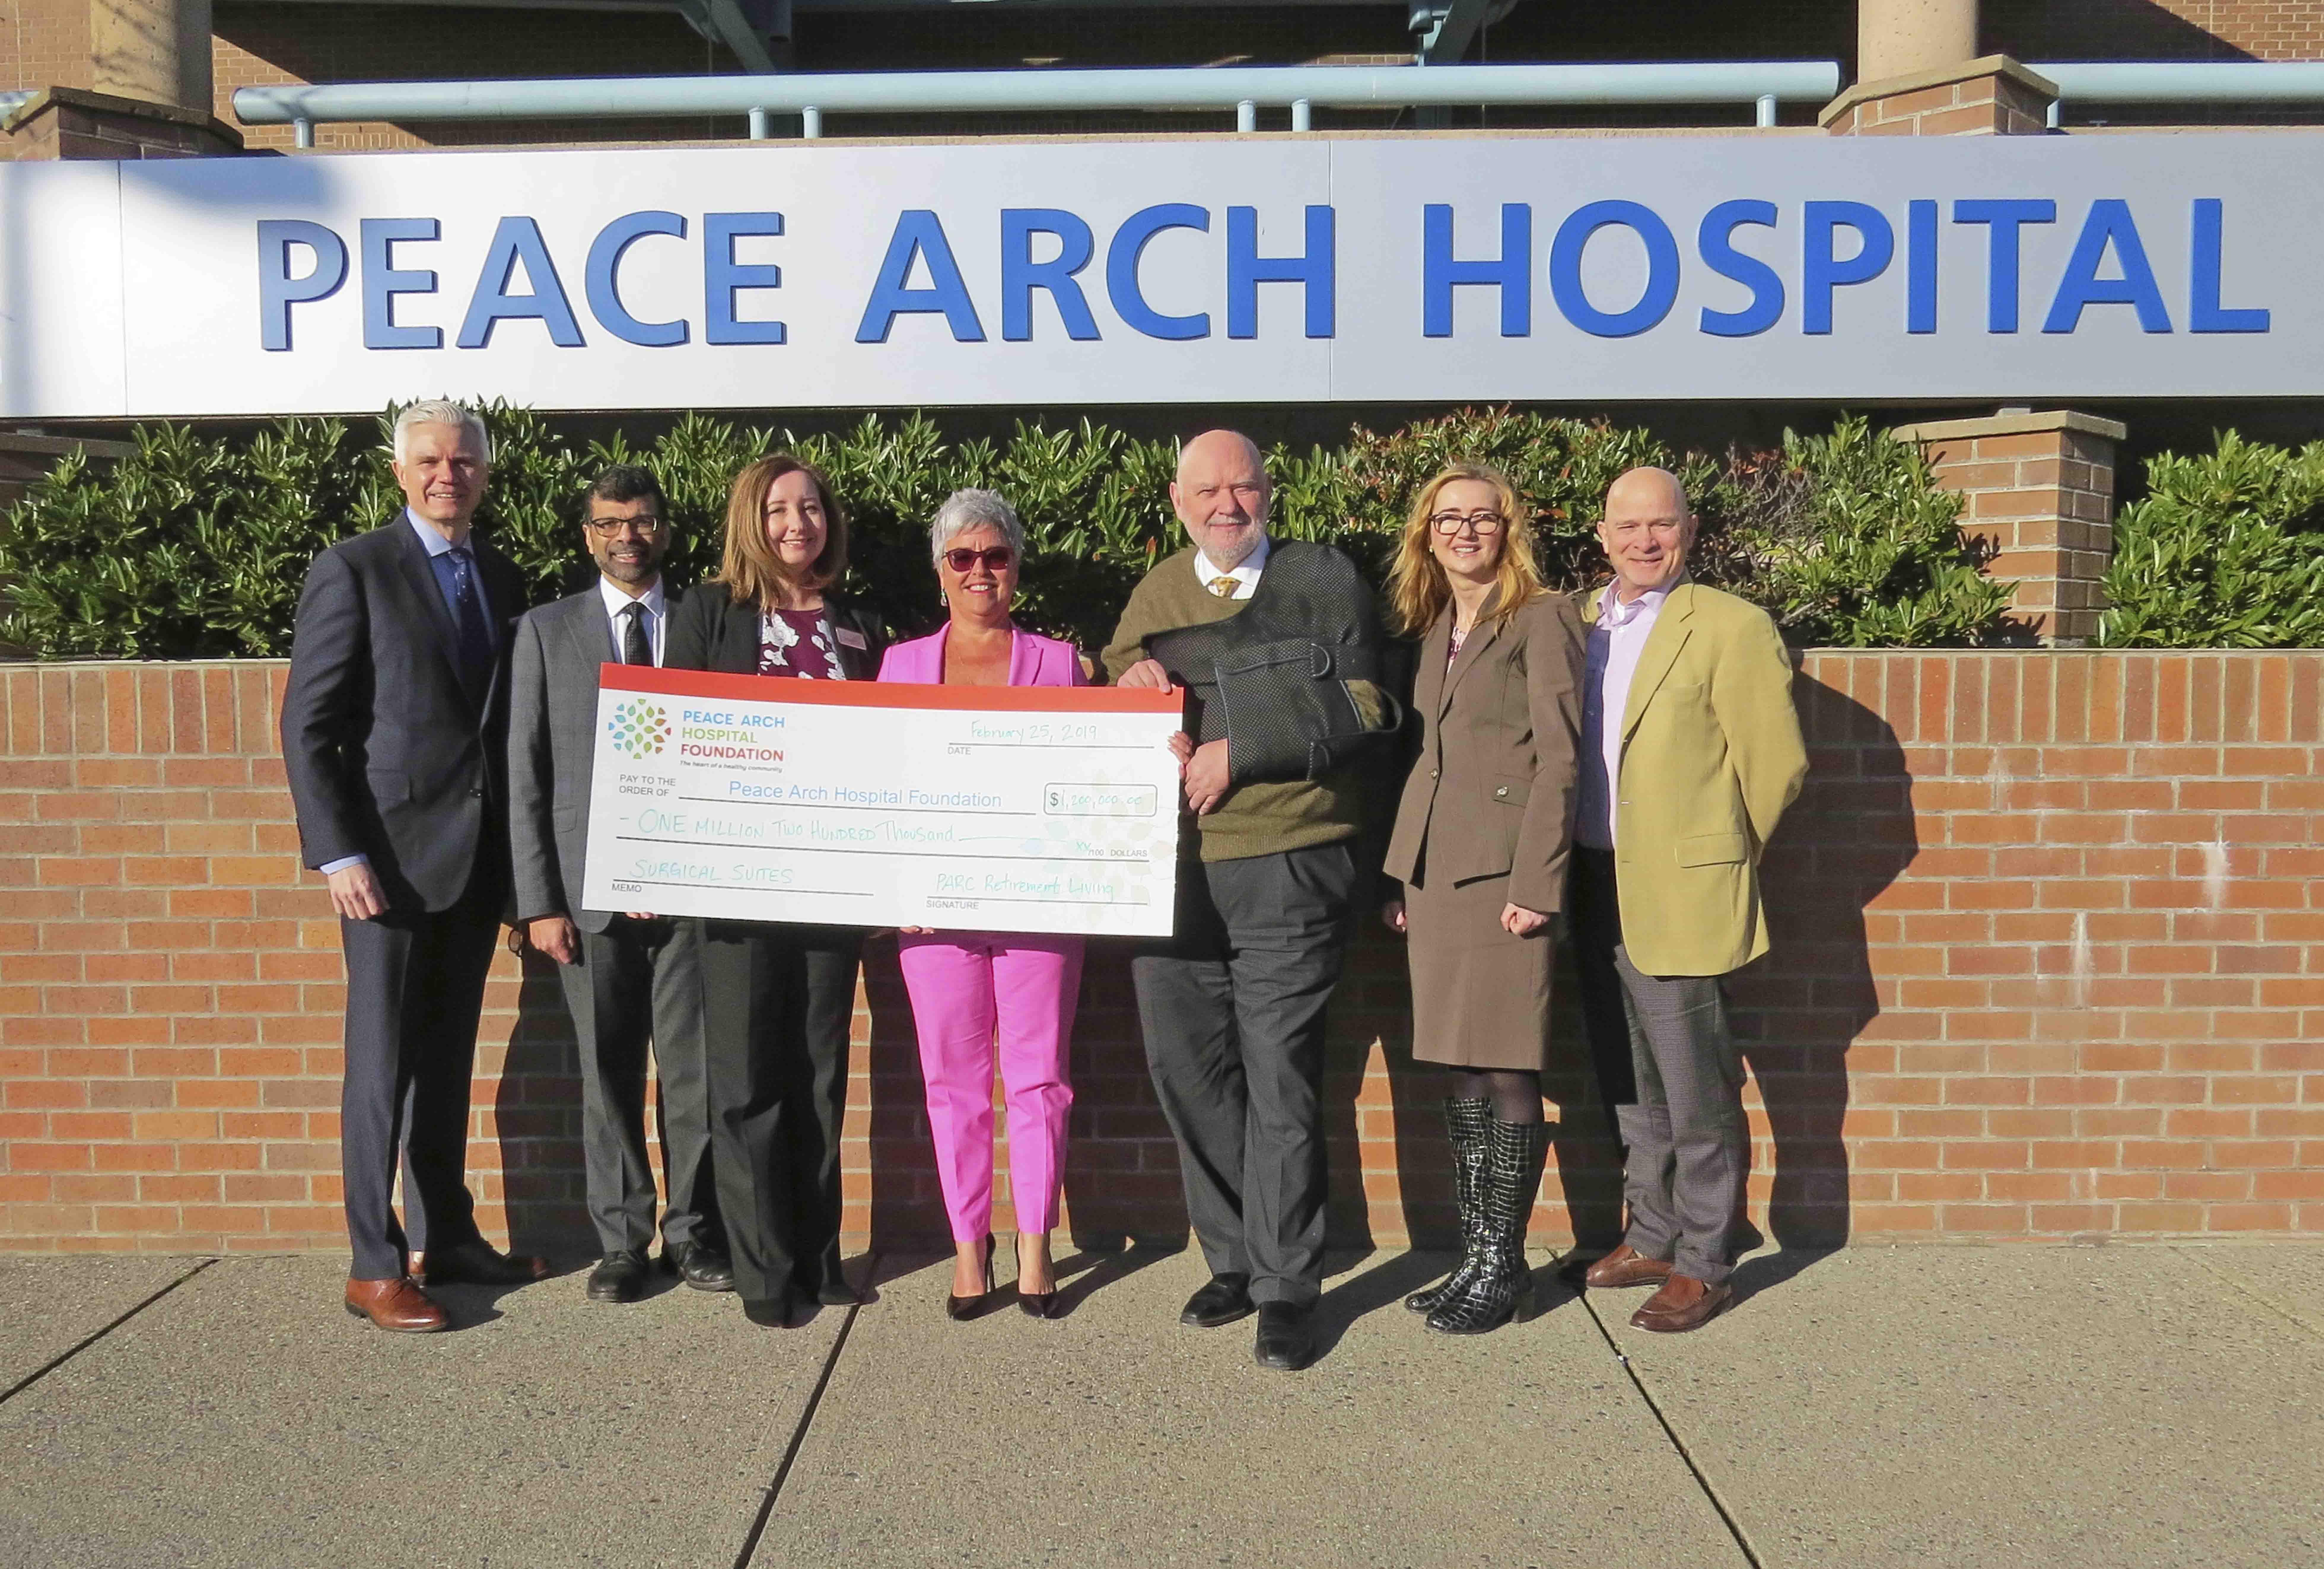 PARC representatives and Peace Arch Hospital Foundation